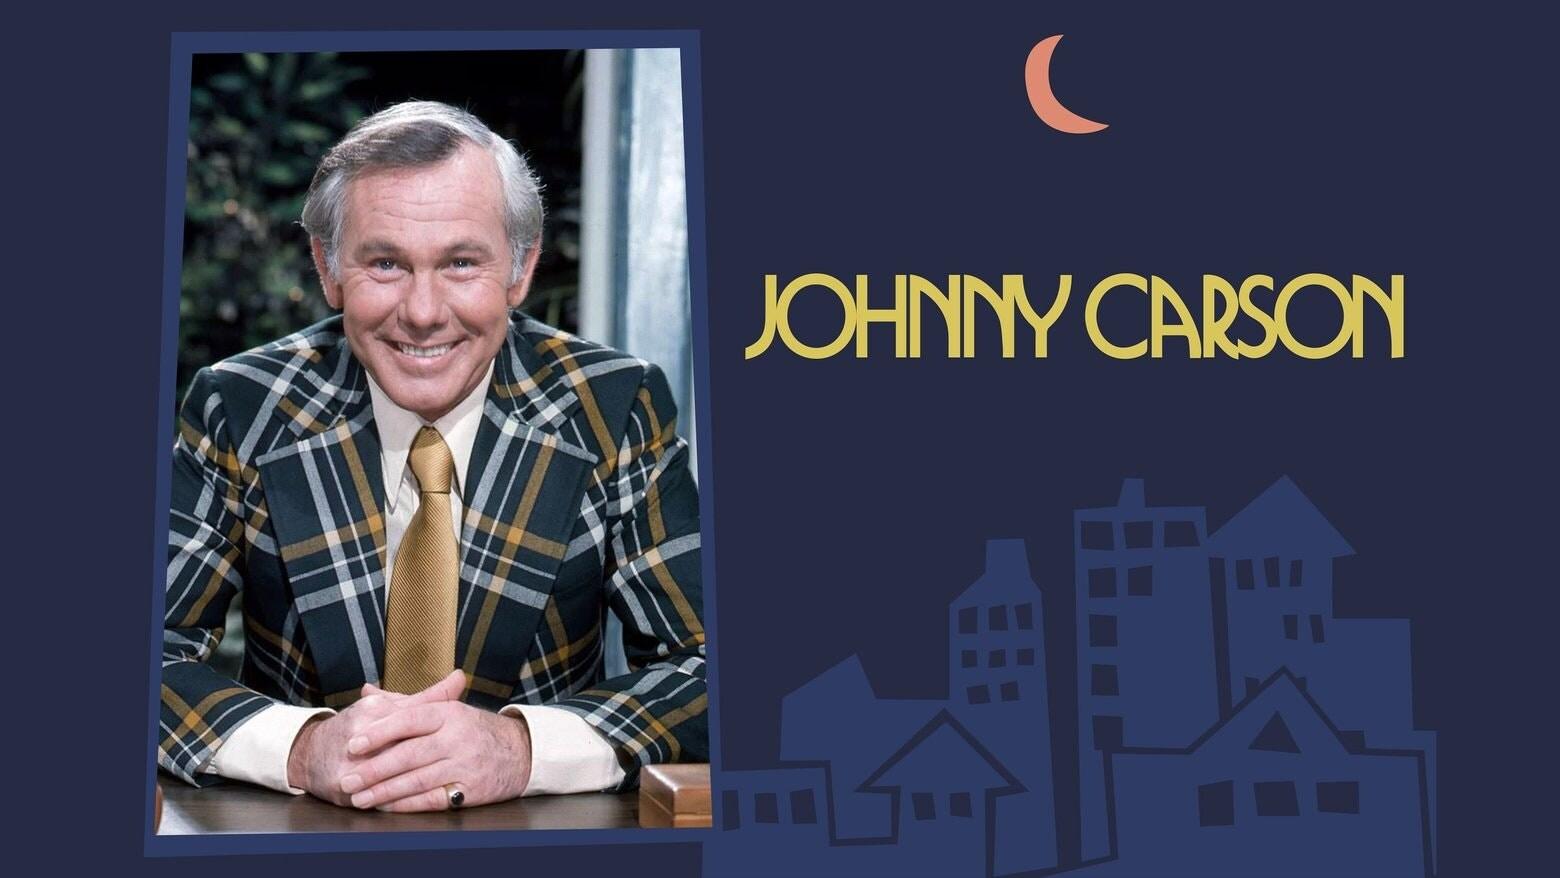 The Johnny Carson Show: Animal Antics With Jim Fowler (9/7/89)